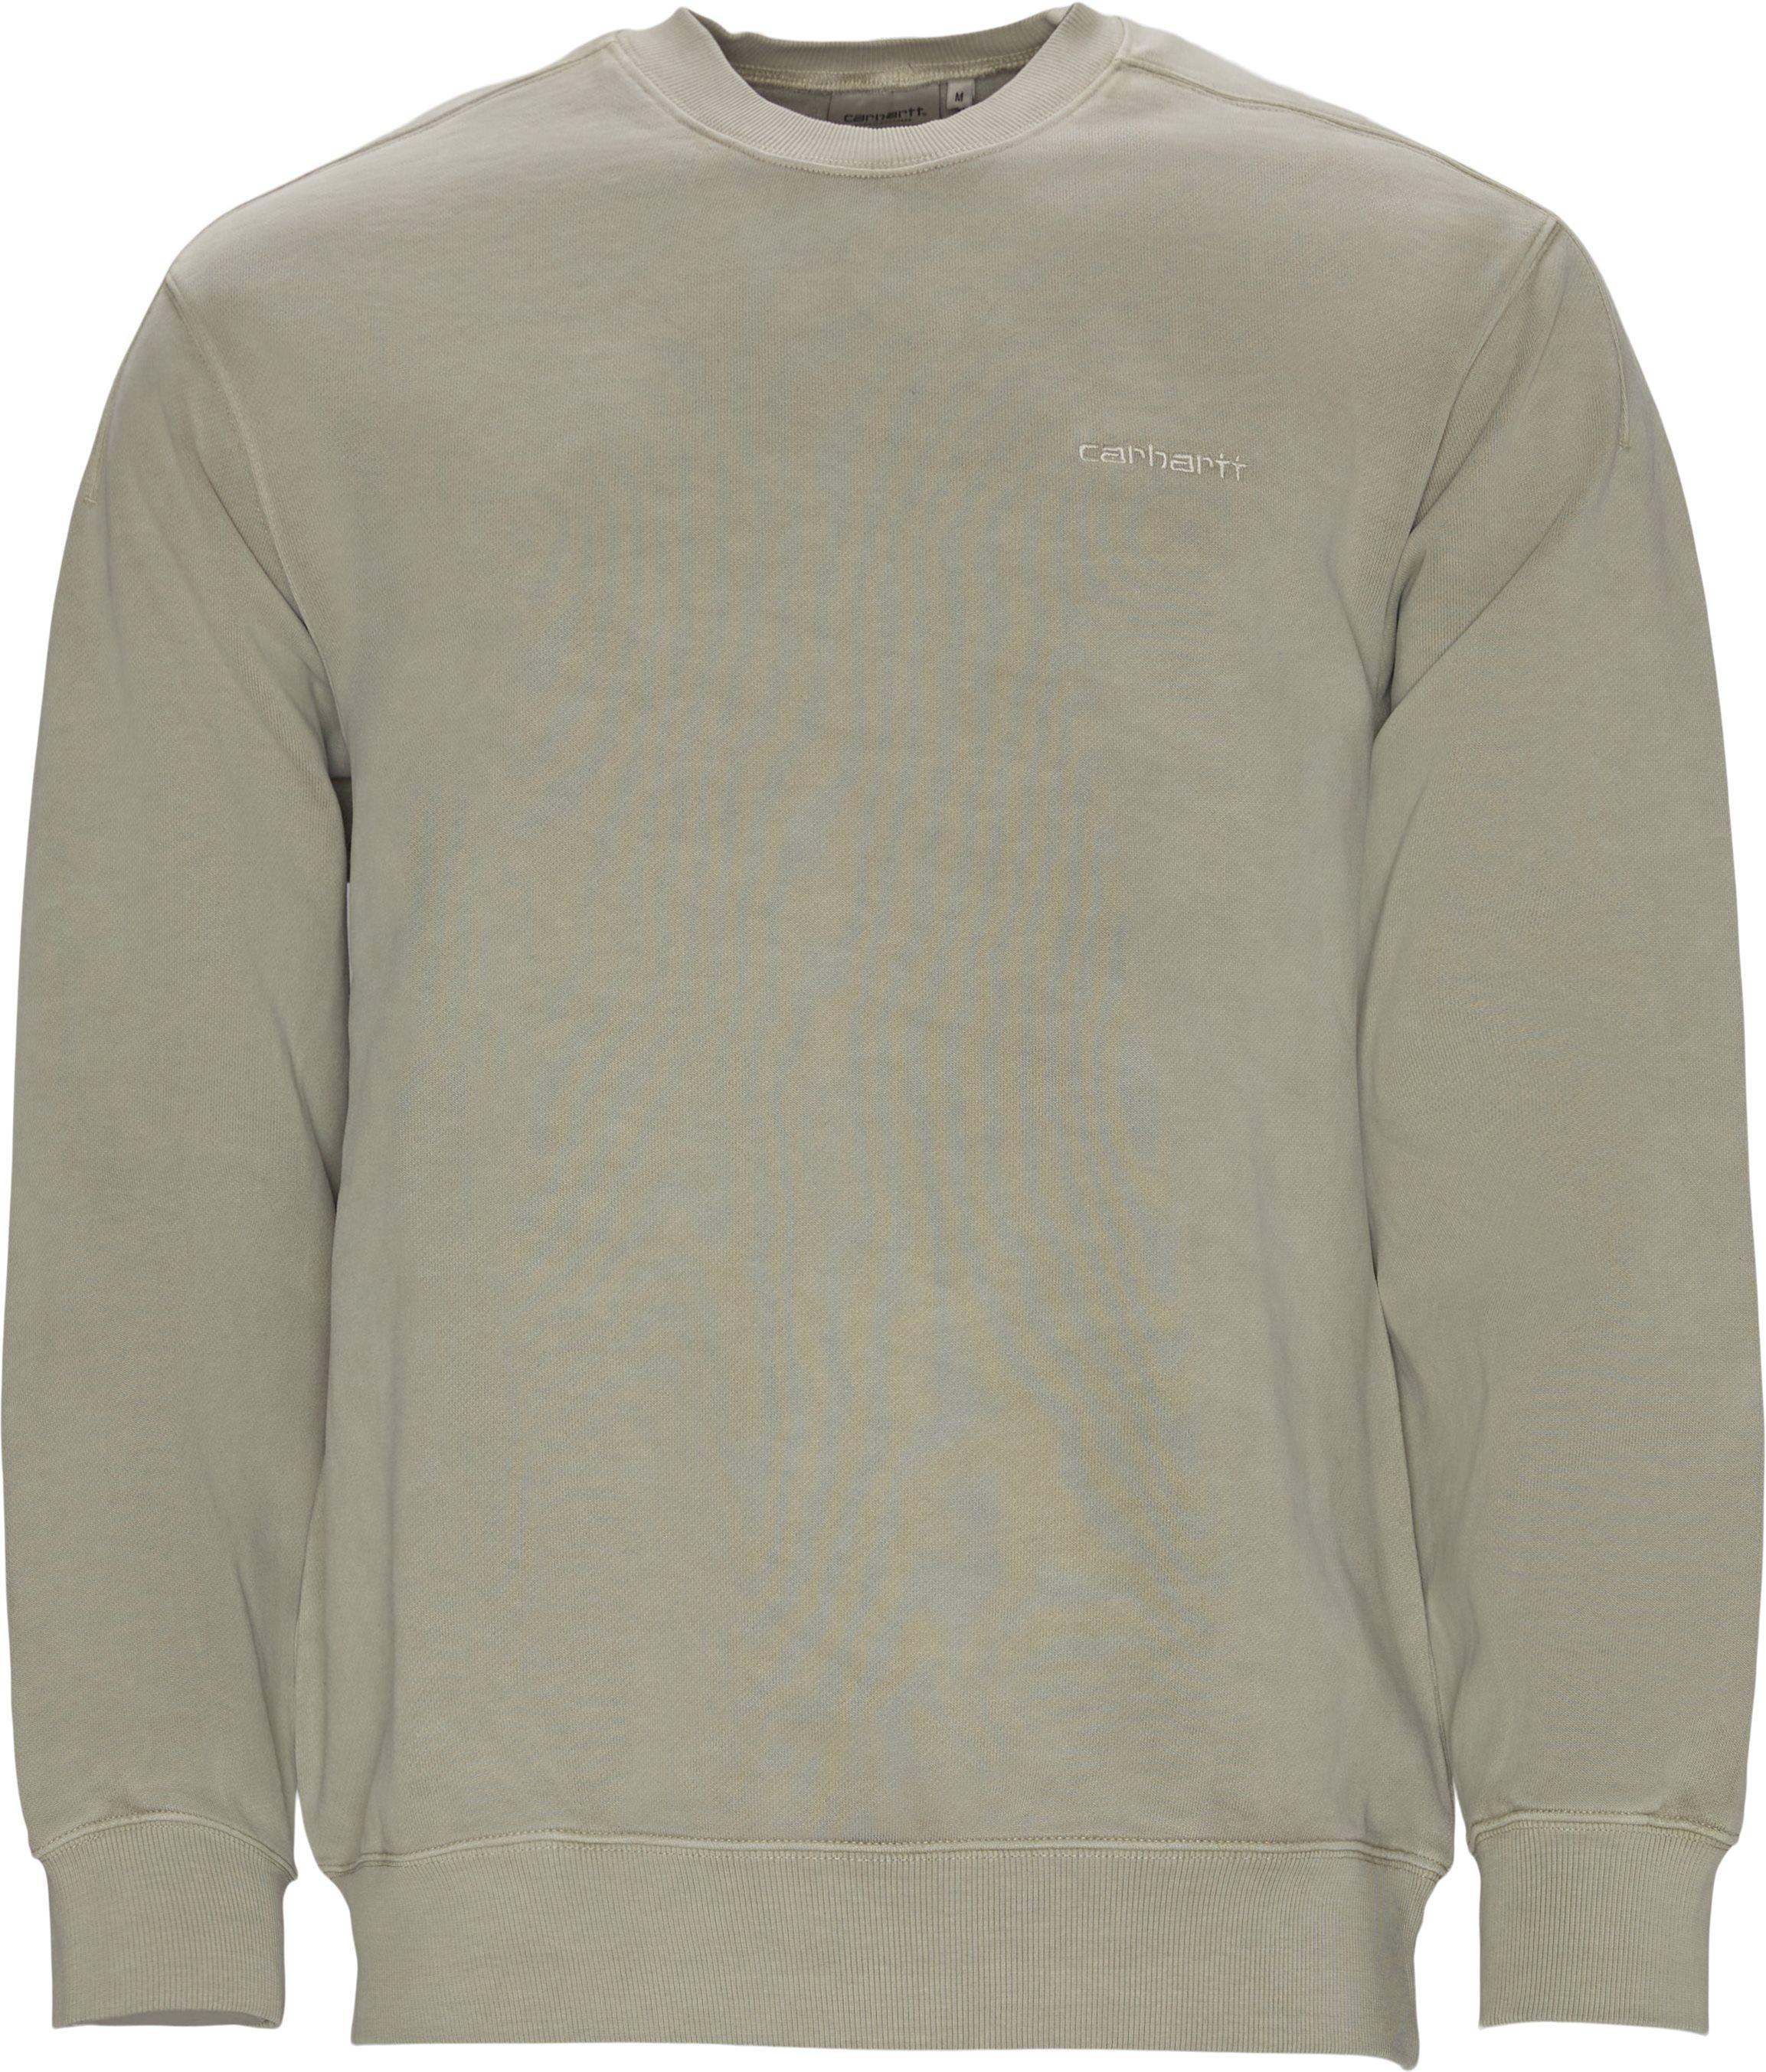 Ashfield Crewneck Sweatshirt - Sweatshirts - Regular fit - Sand